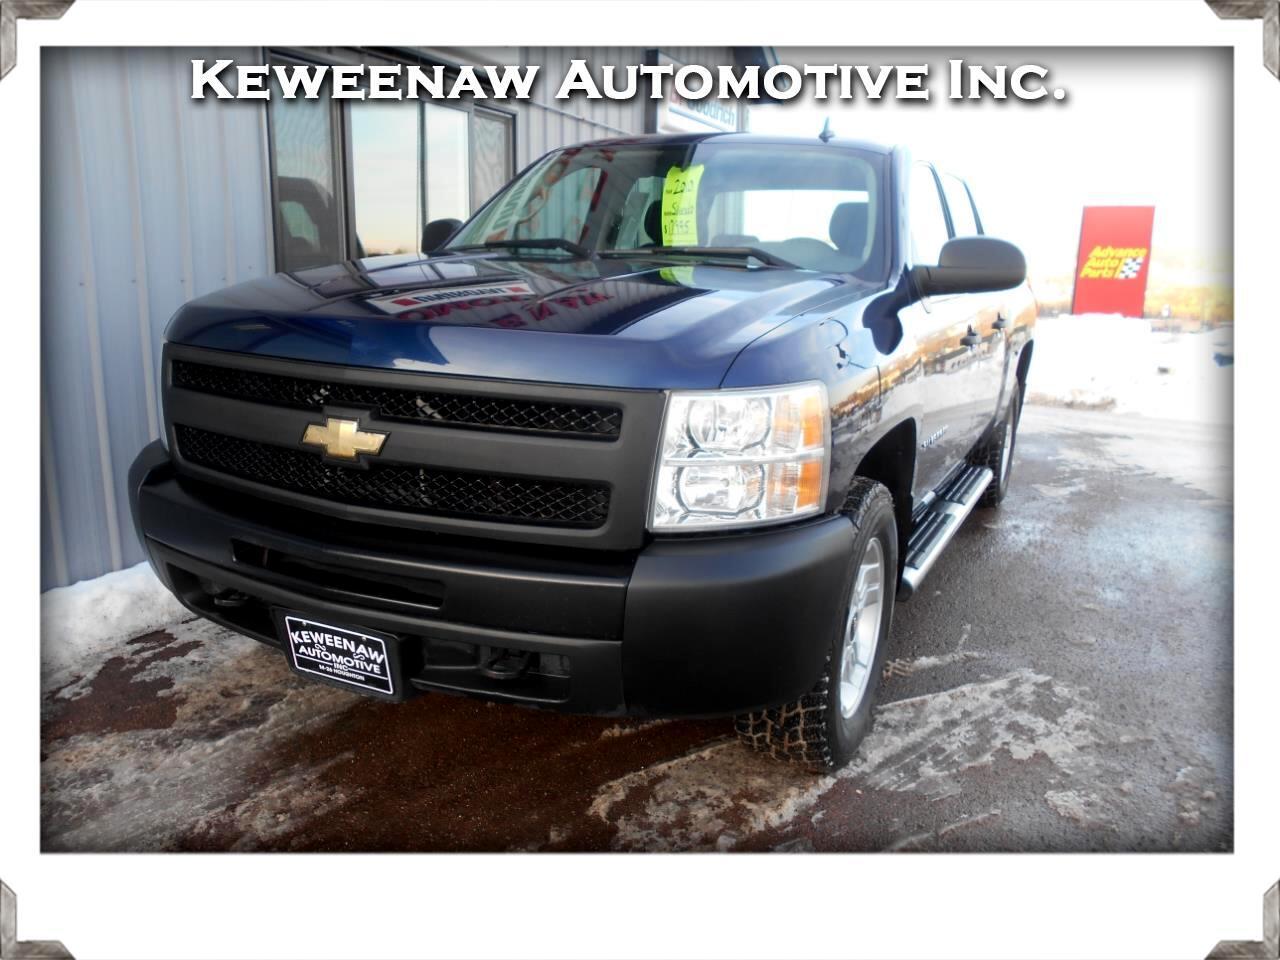 "2010 Chevrolet Silverado 1500 4WD Crew Cab 143.5"" Work Truck"